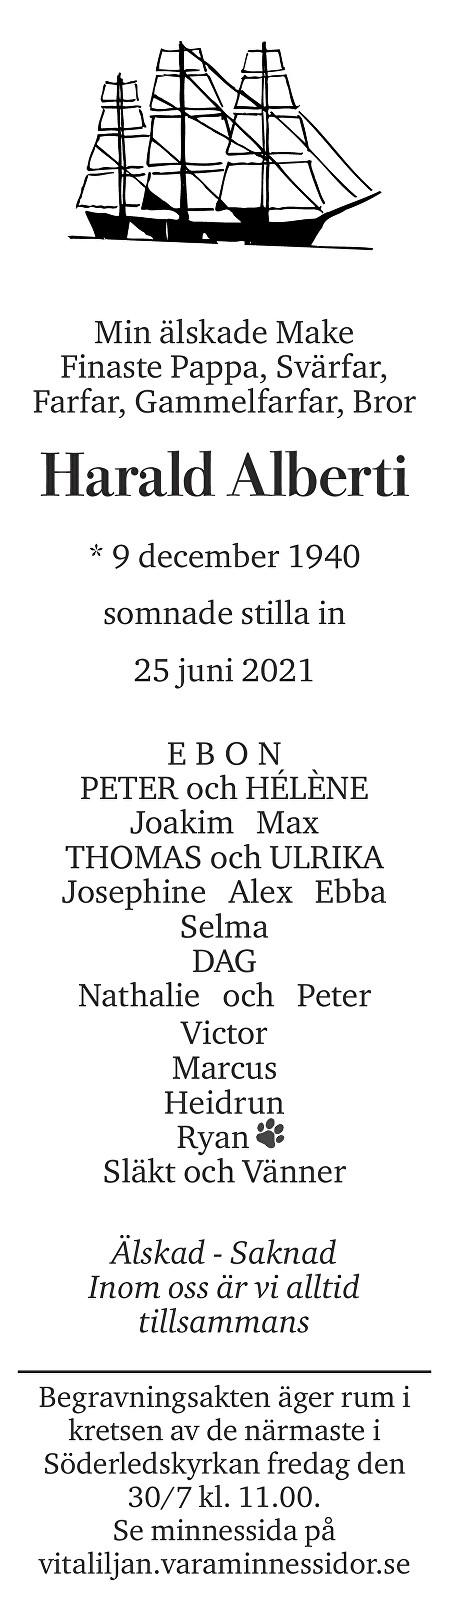 Harald Alberti Death notice